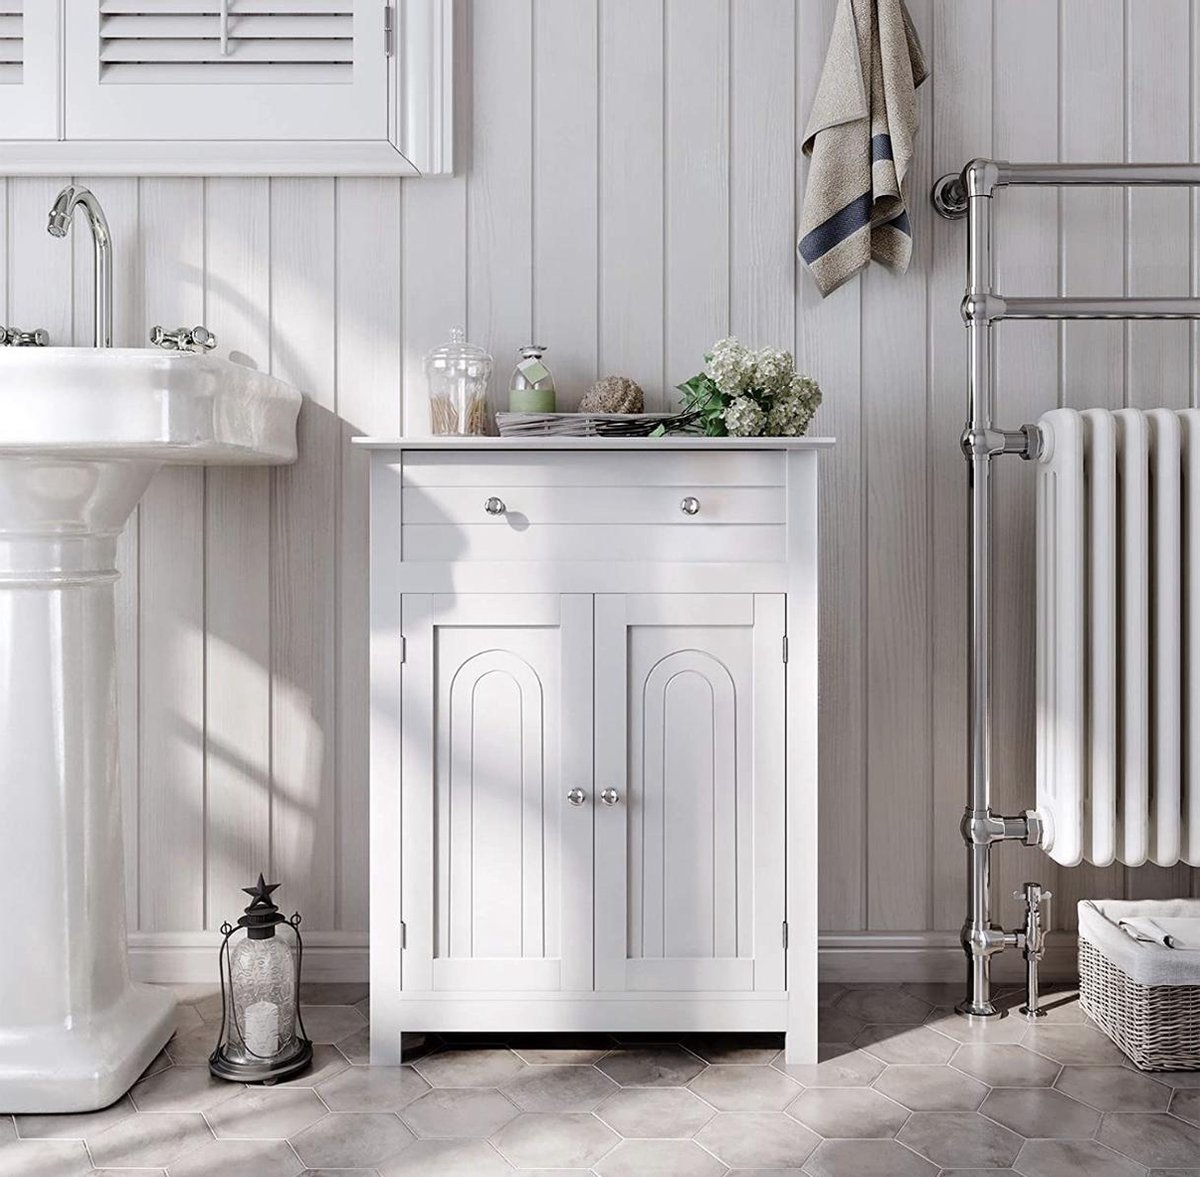 VASAGLE badkamermeubel, badkamermeubel met lade en verstelbare plank, landelijke keukenkast, houten opbergkast, wit, 60 x 80 x 30 cm (B x H x D), BBC61WT